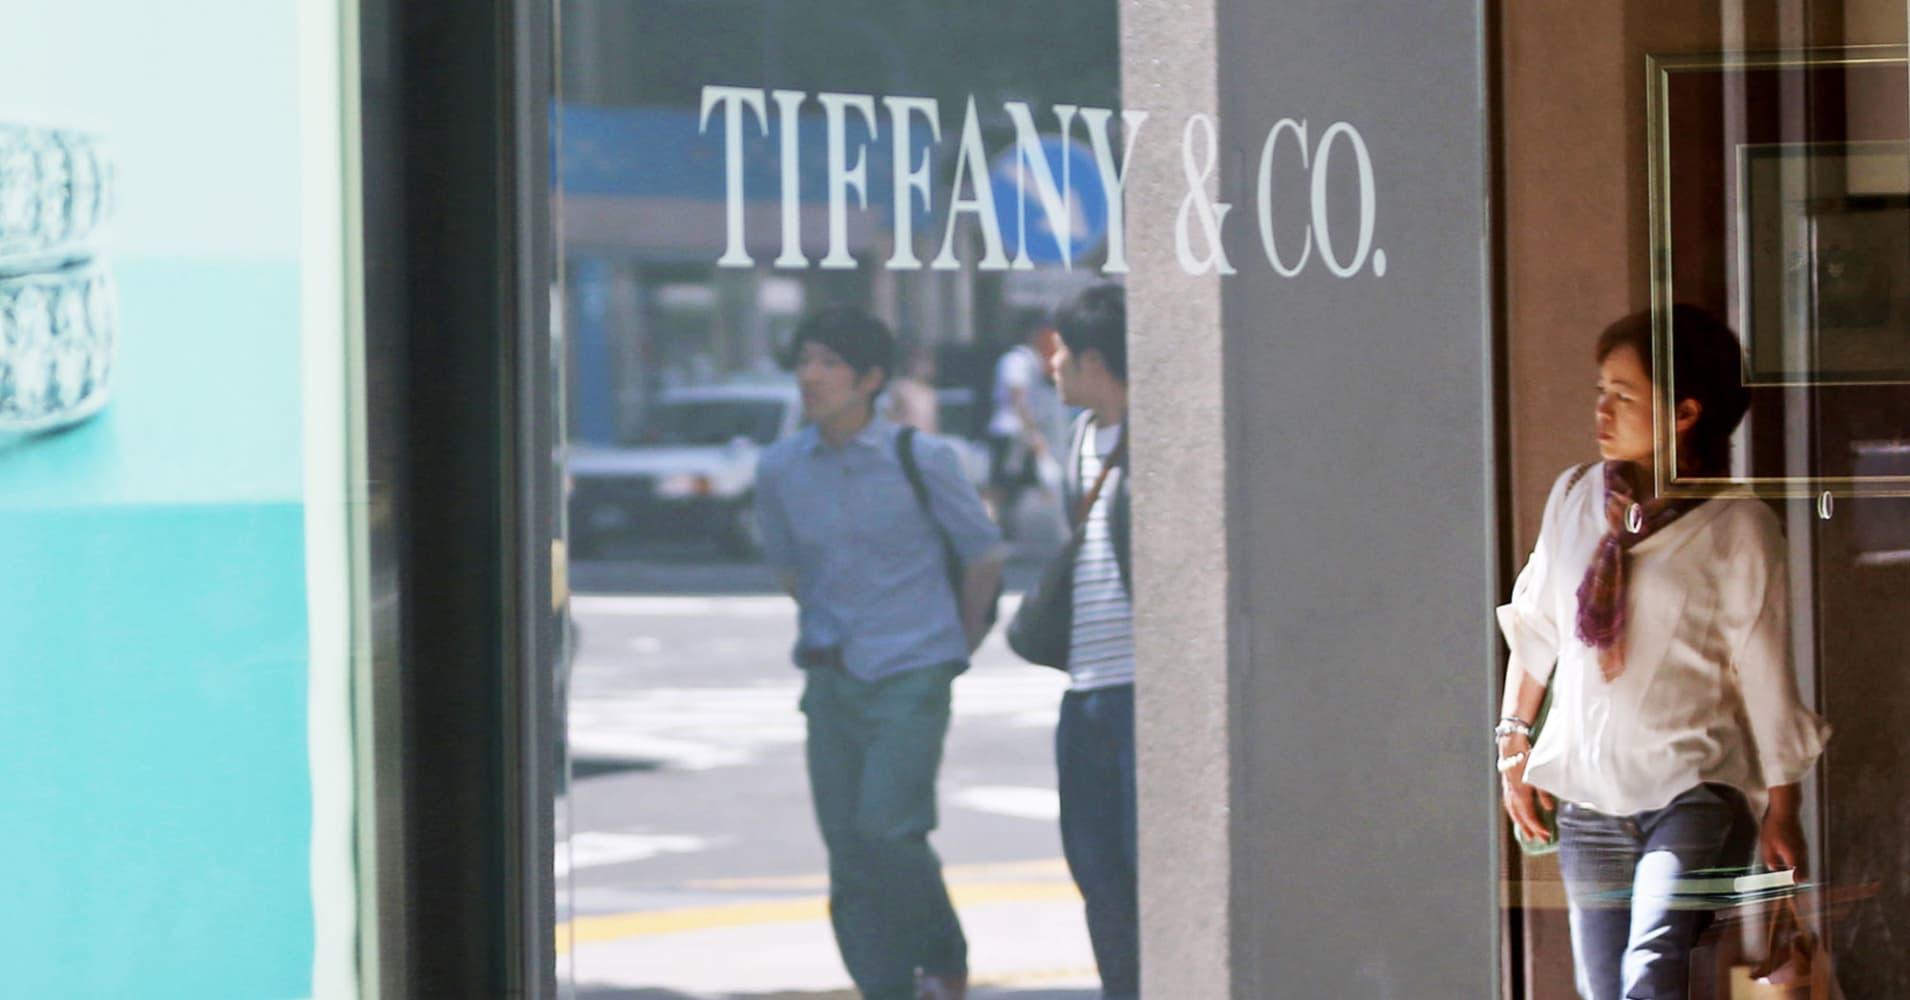 Tiffany Shares Jump After Citi Upgrades